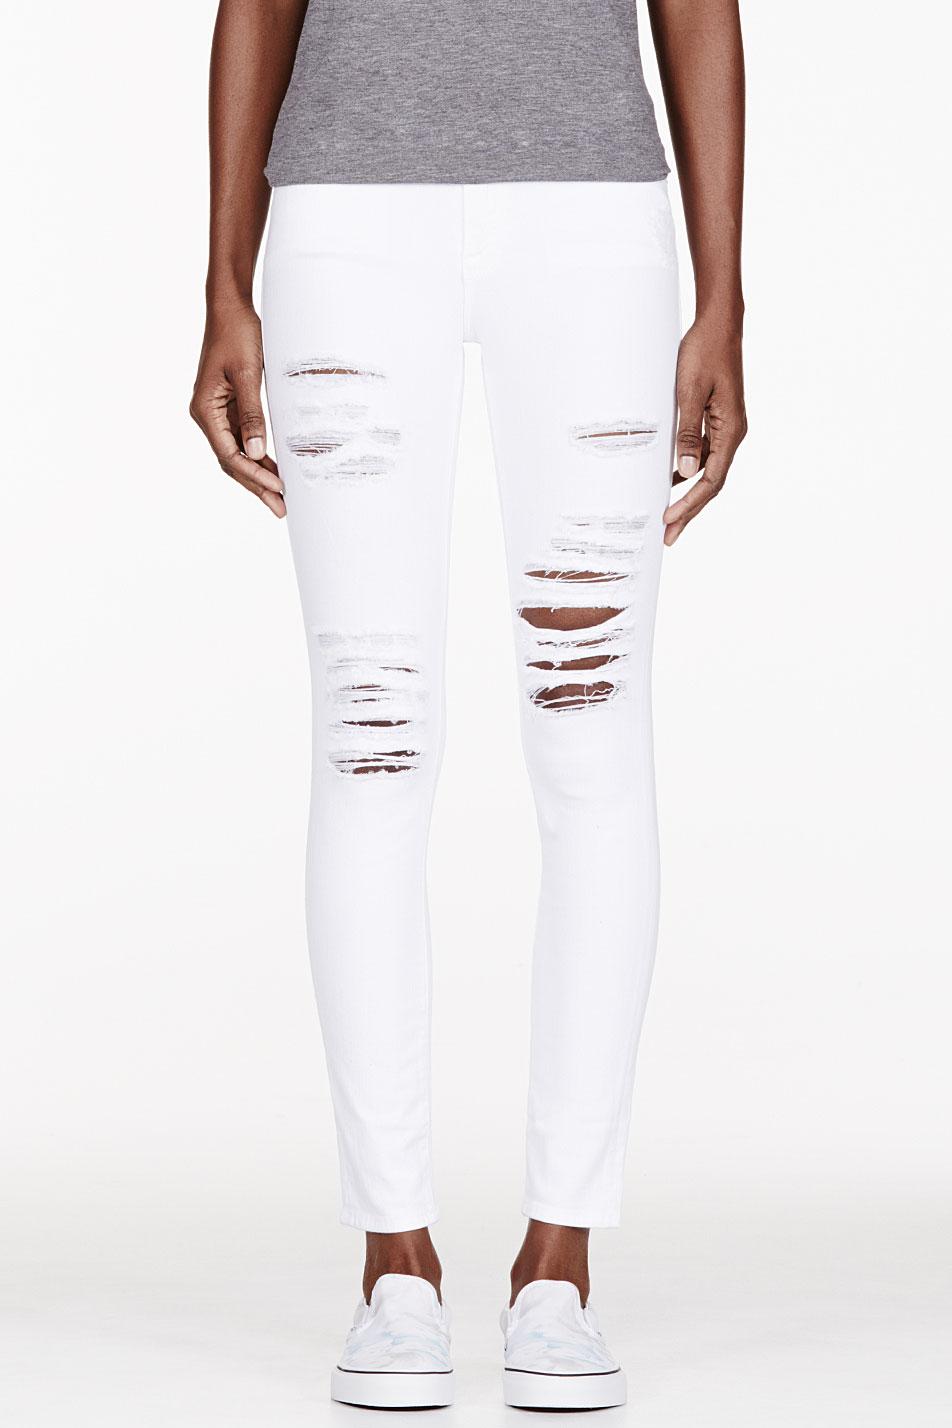 Frame Denim Le Color Rip Skinny Jeans In White Lyst